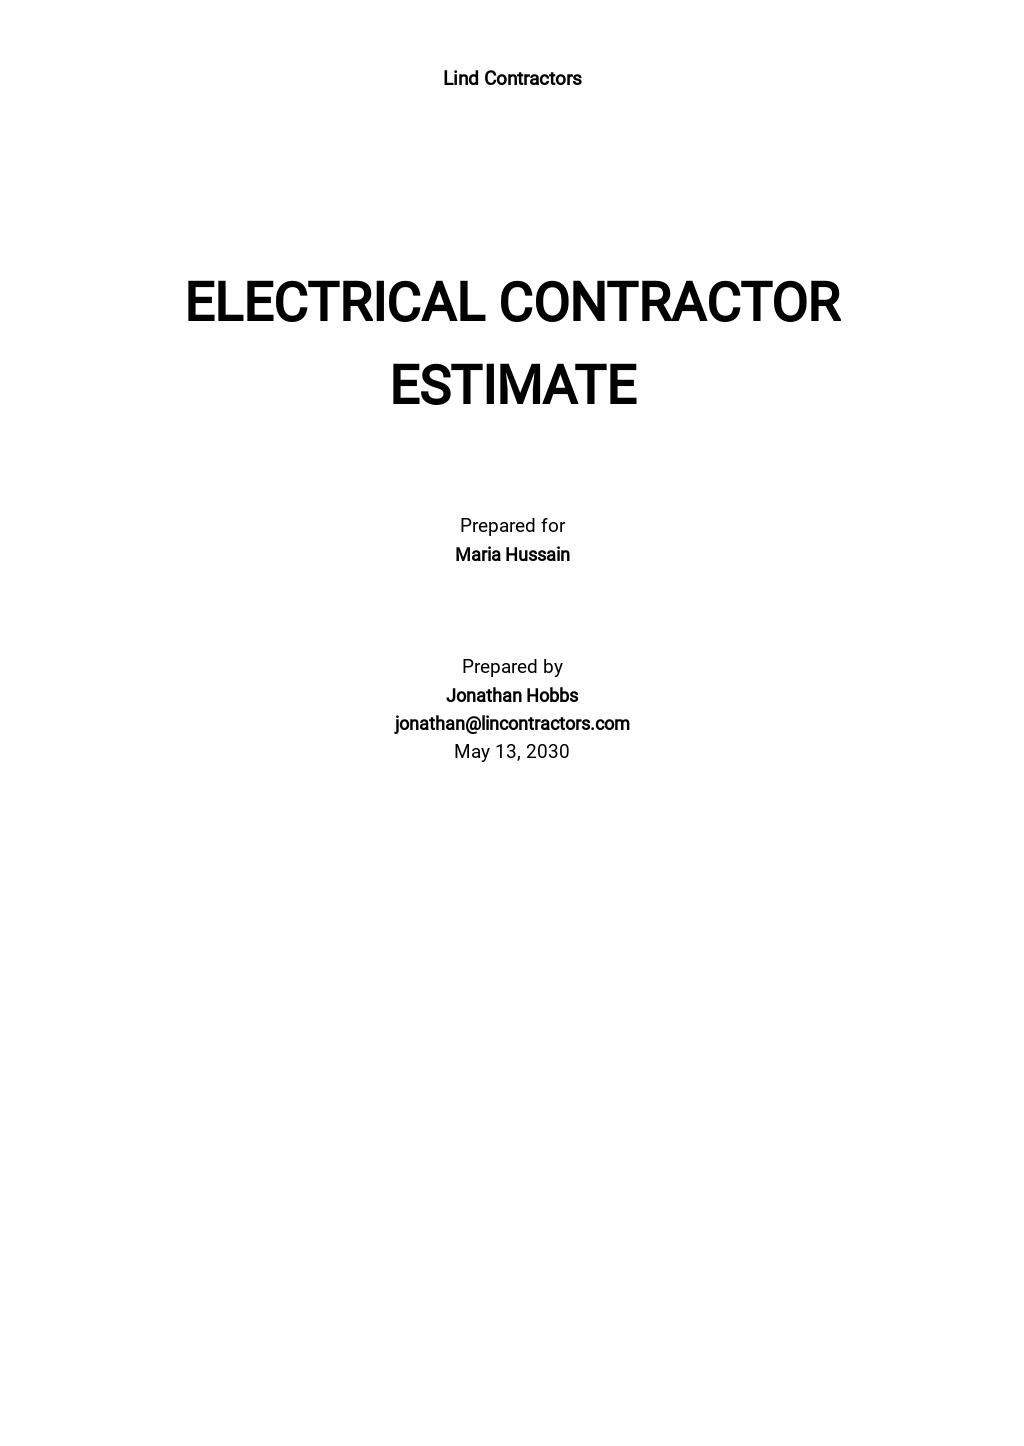 Electrical Contractor Estimate Template